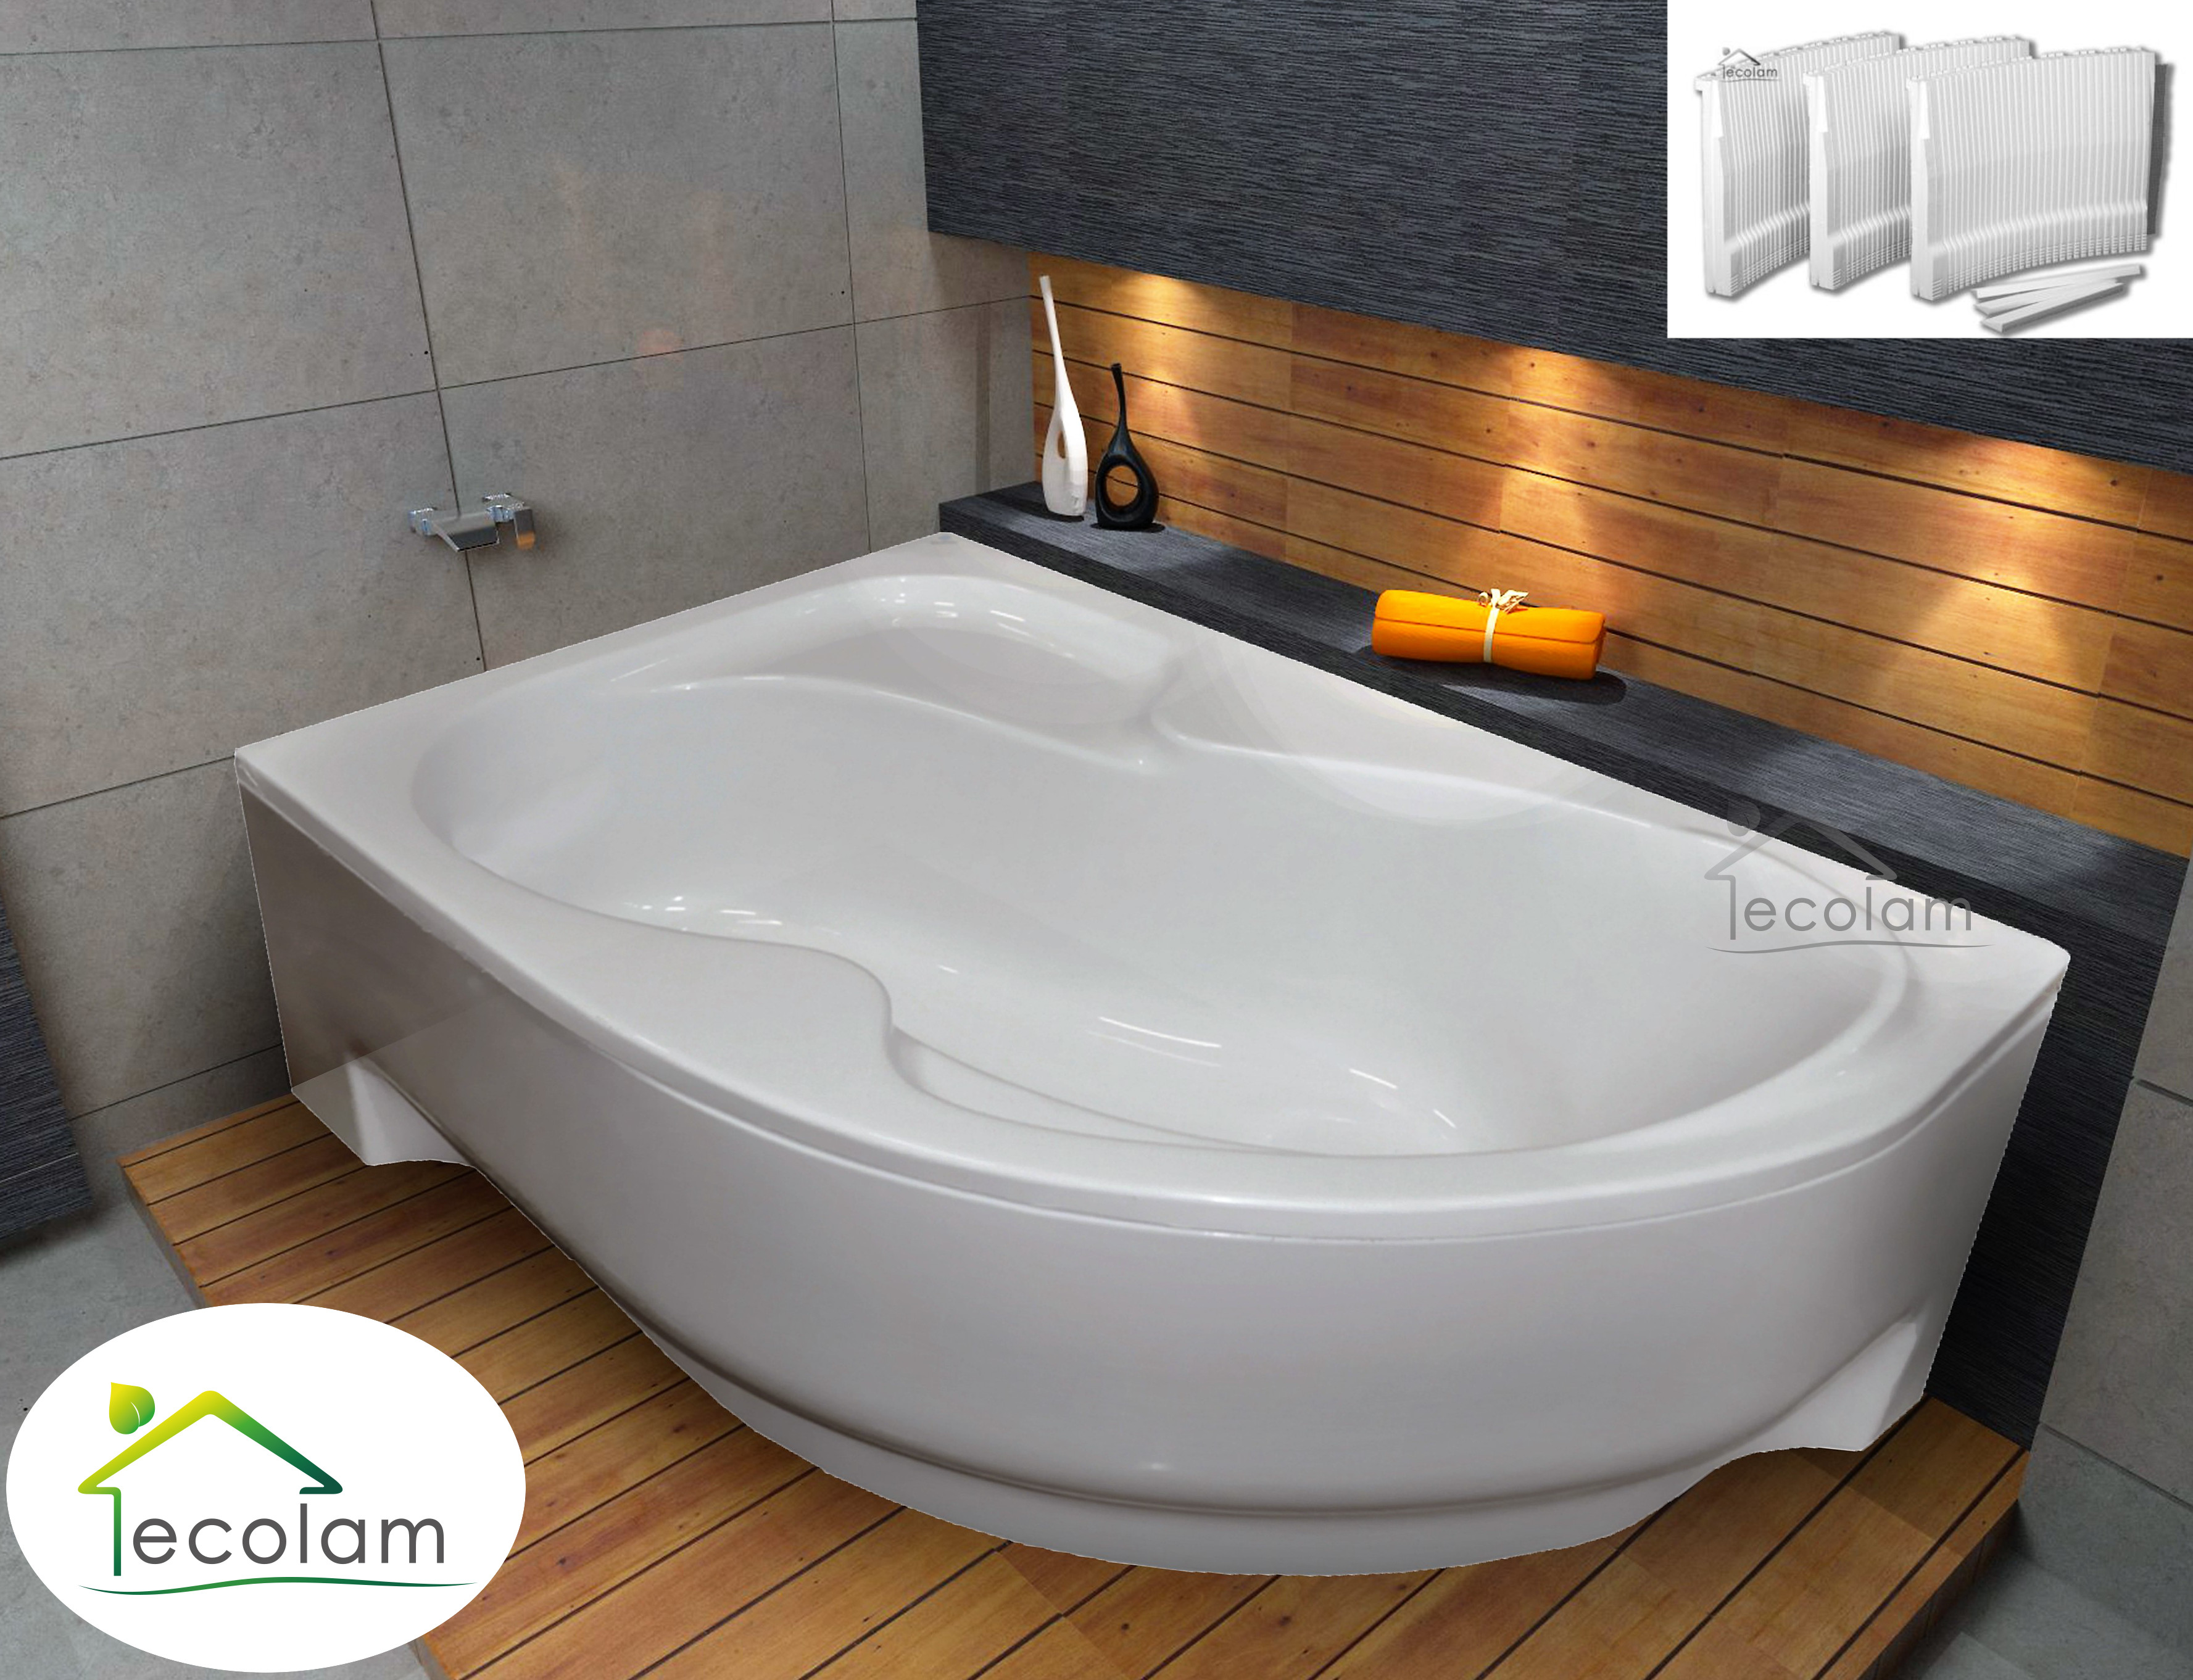 badewanne wanne eckwanne acryl 150 160 170 x 100 cm sch rze styropor links ebay. Black Bedroom Furniture Sets. Home Design Ideas